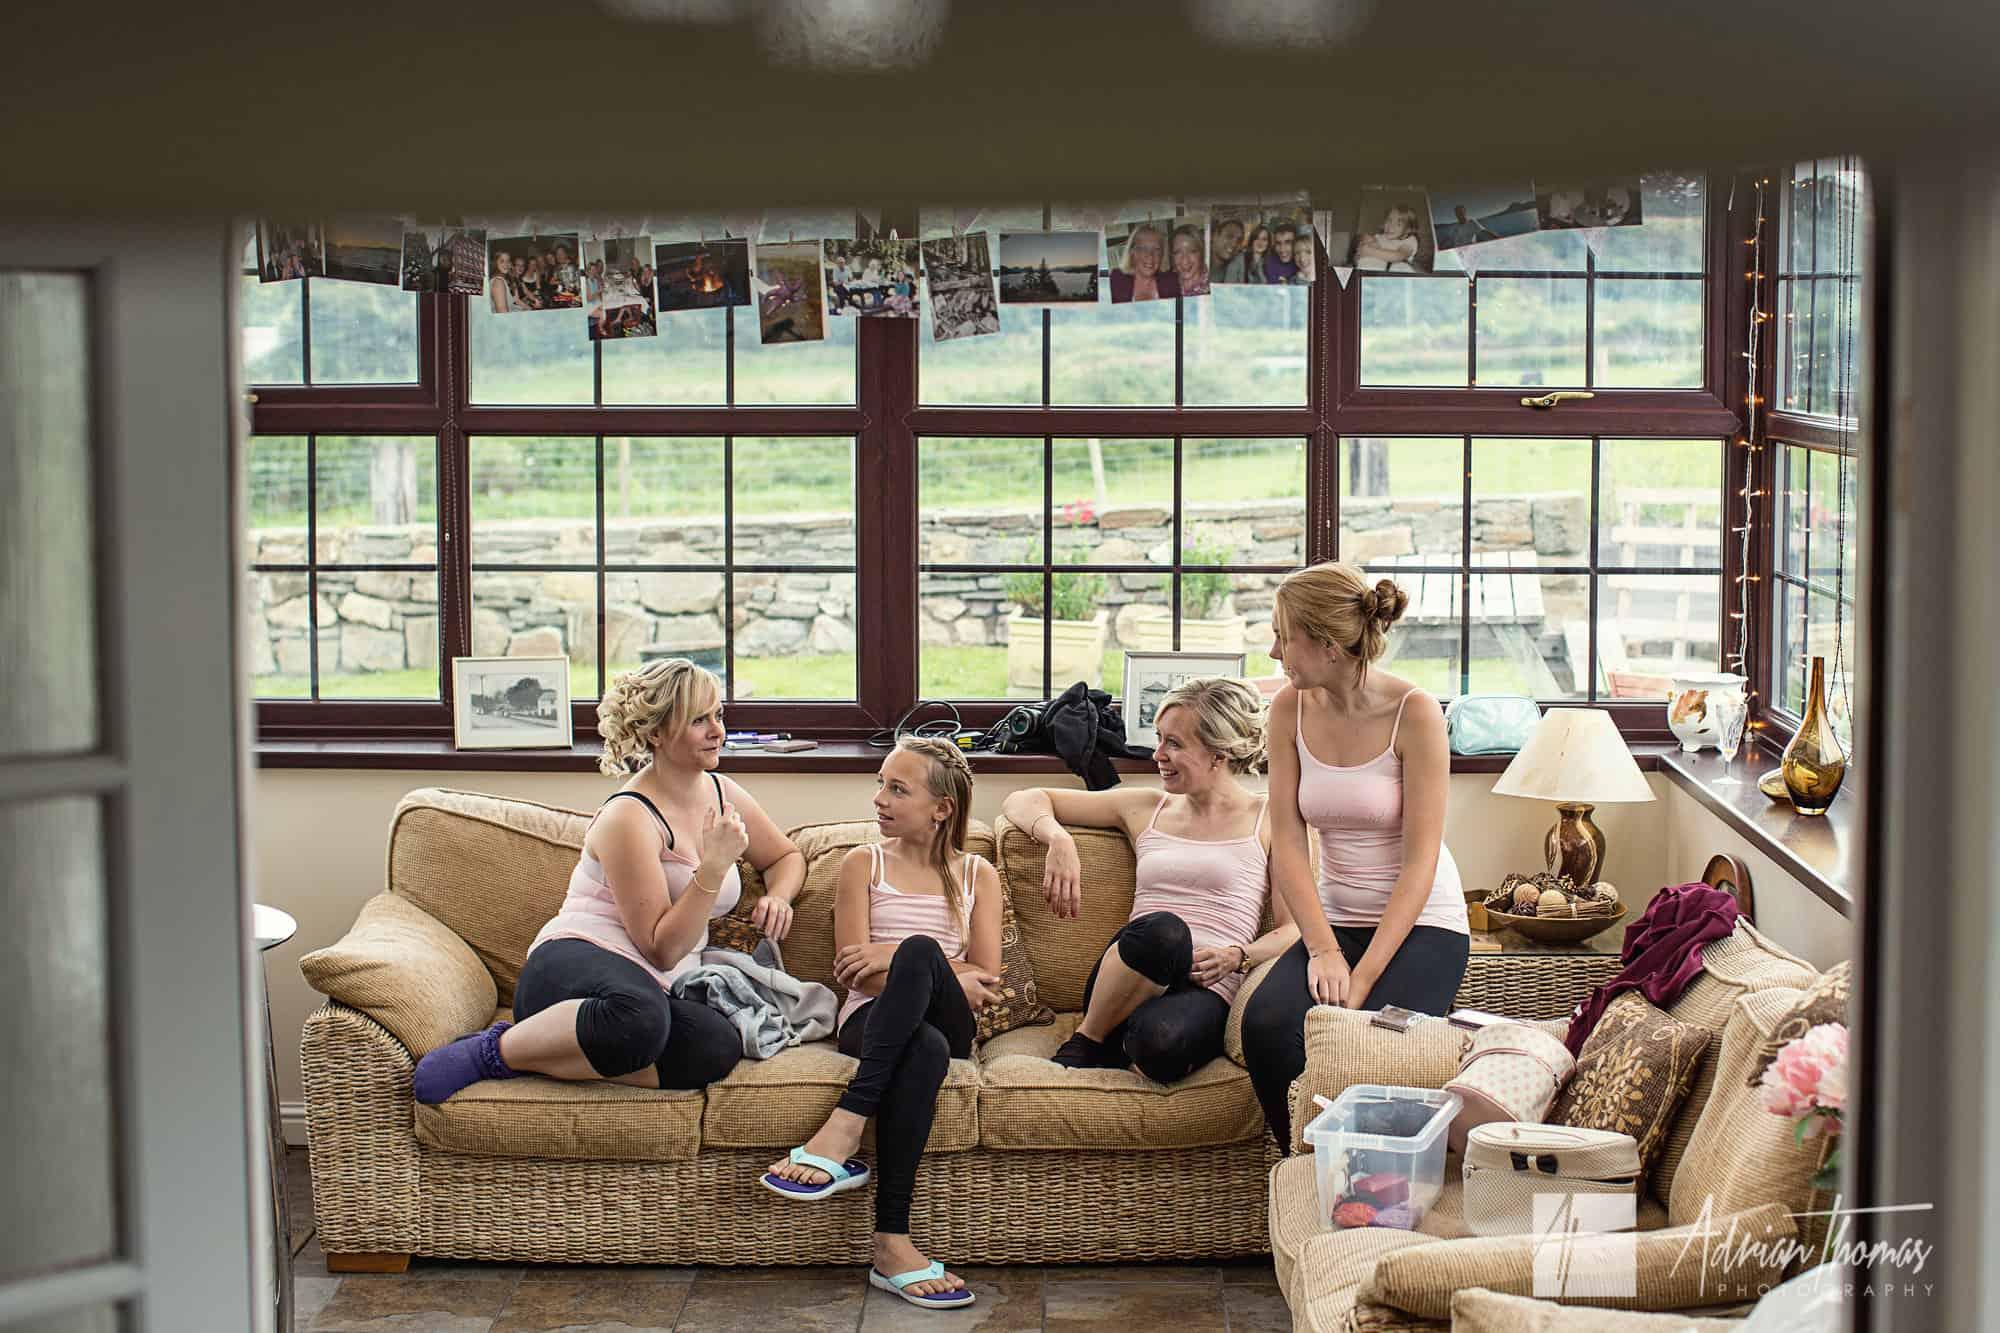 Bridesmaids chatting on settee.